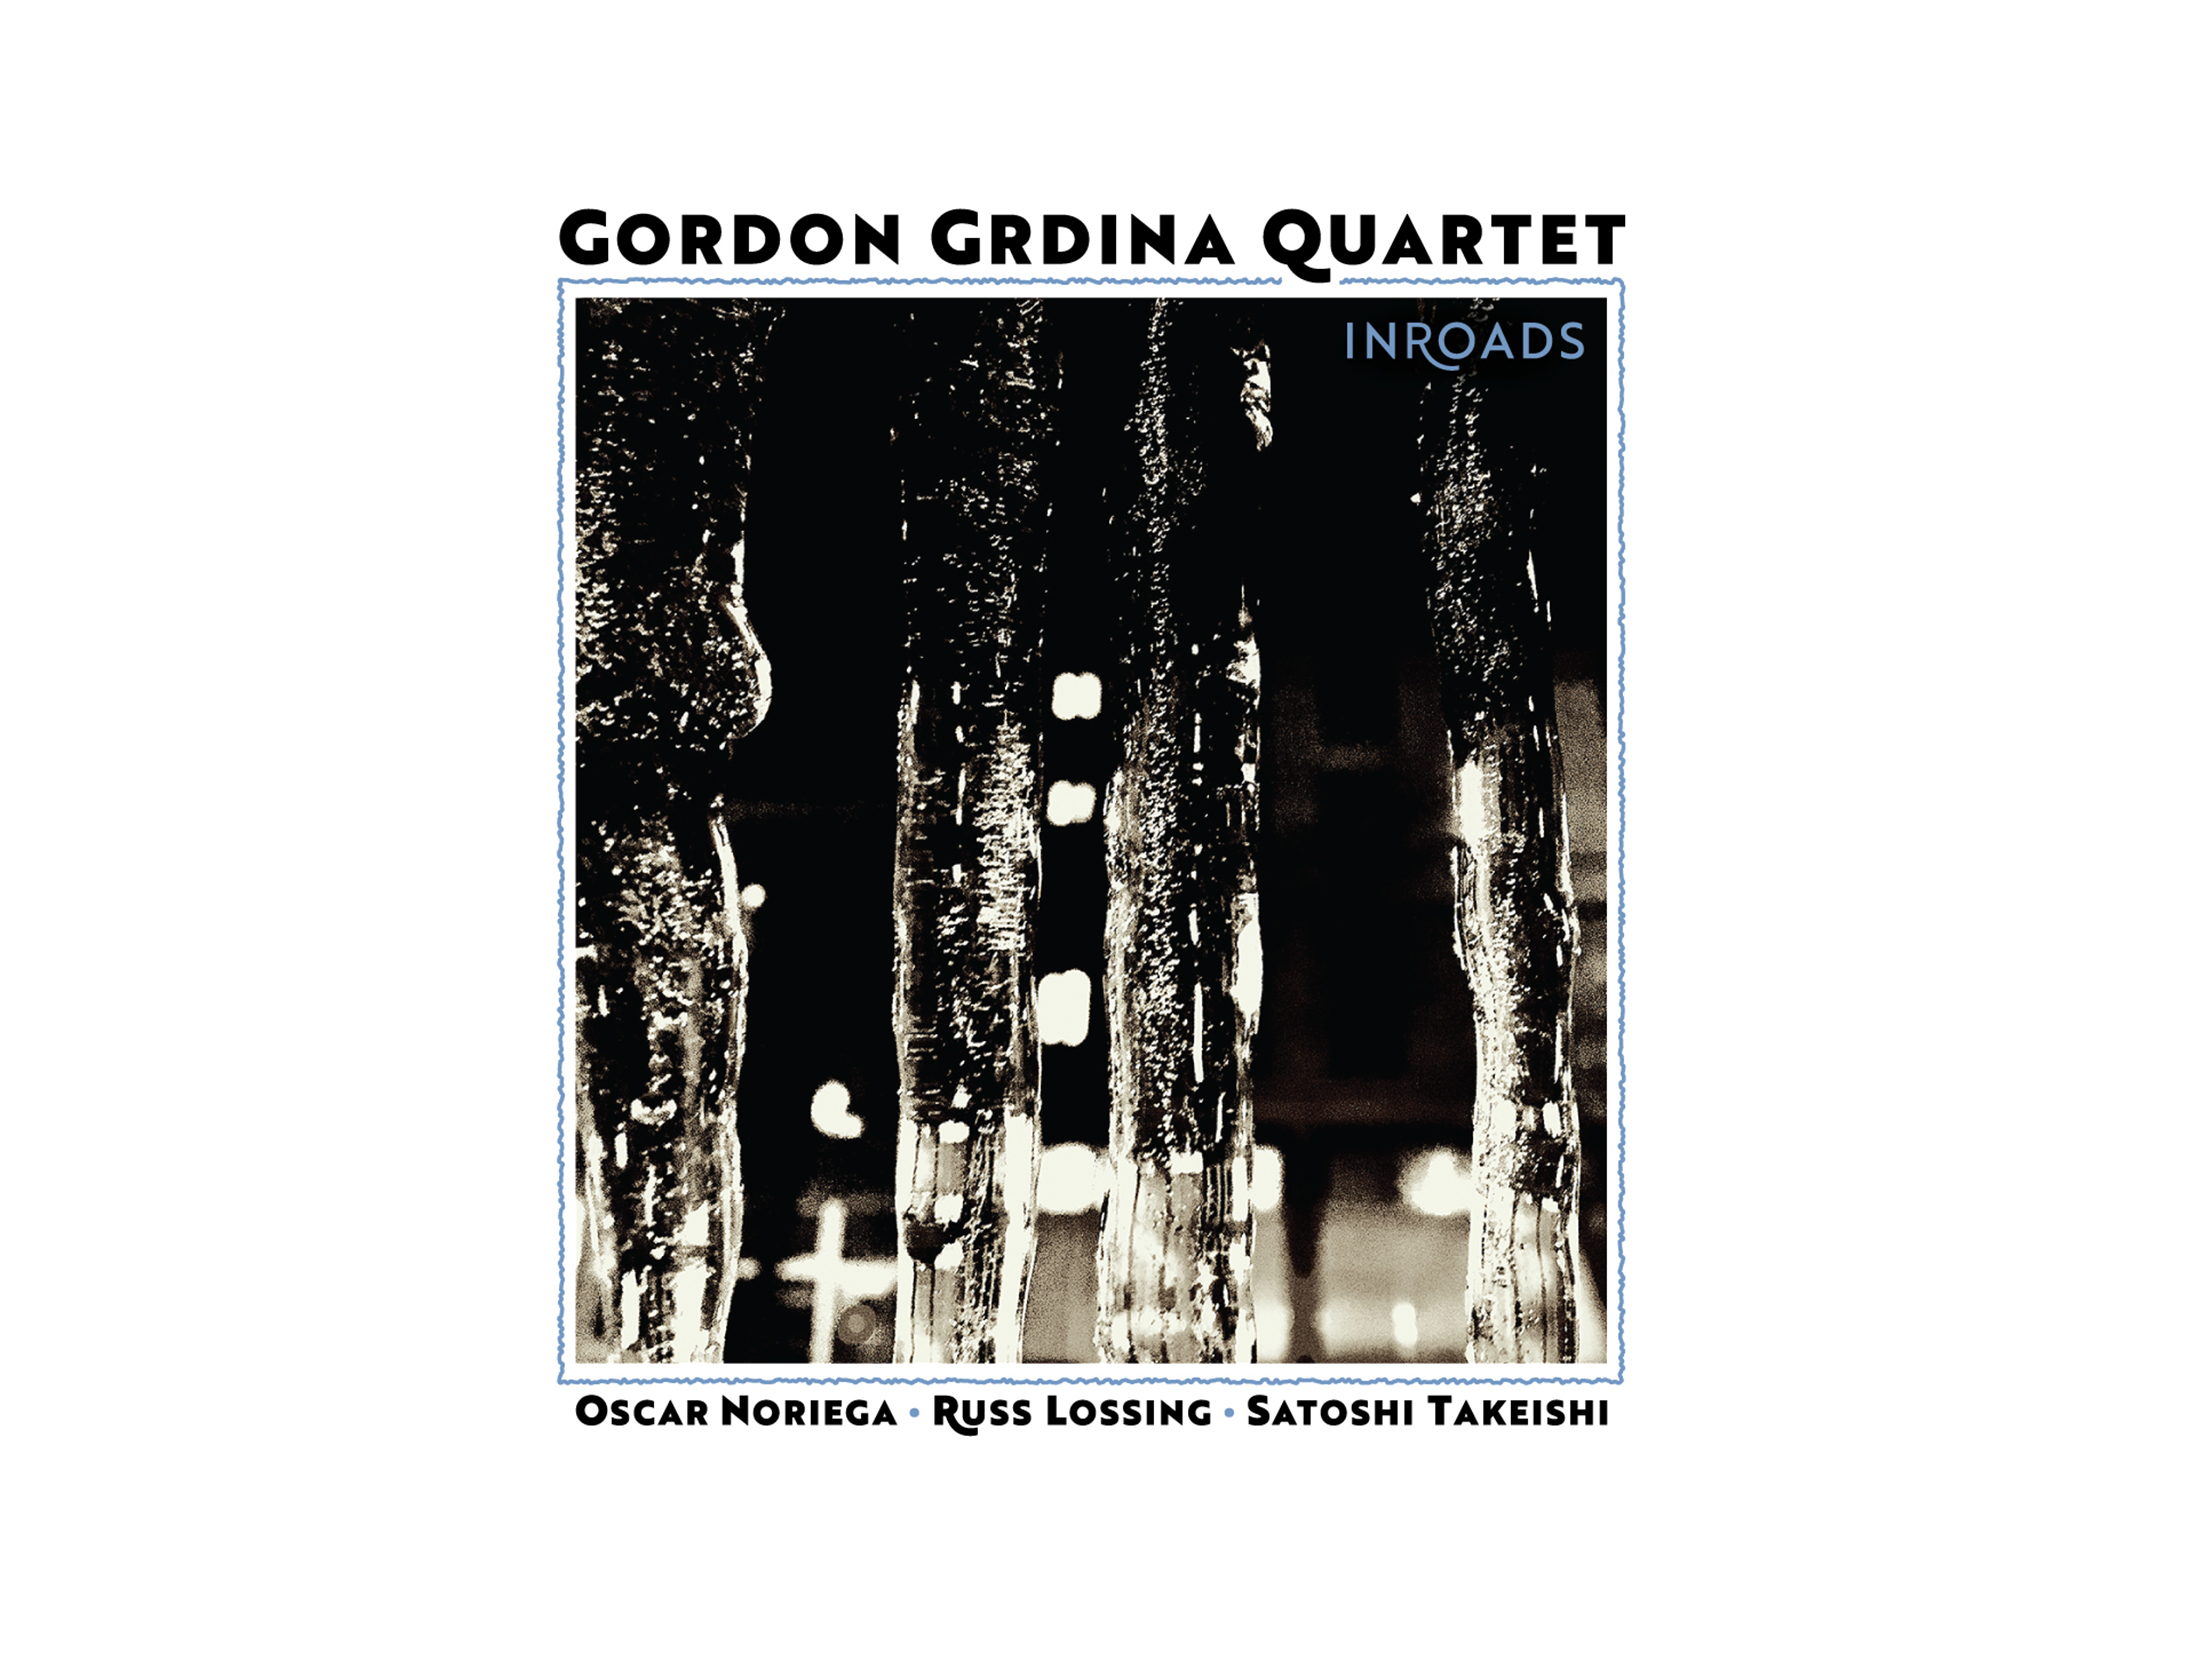 Gordon Grdina Quartet Inroads